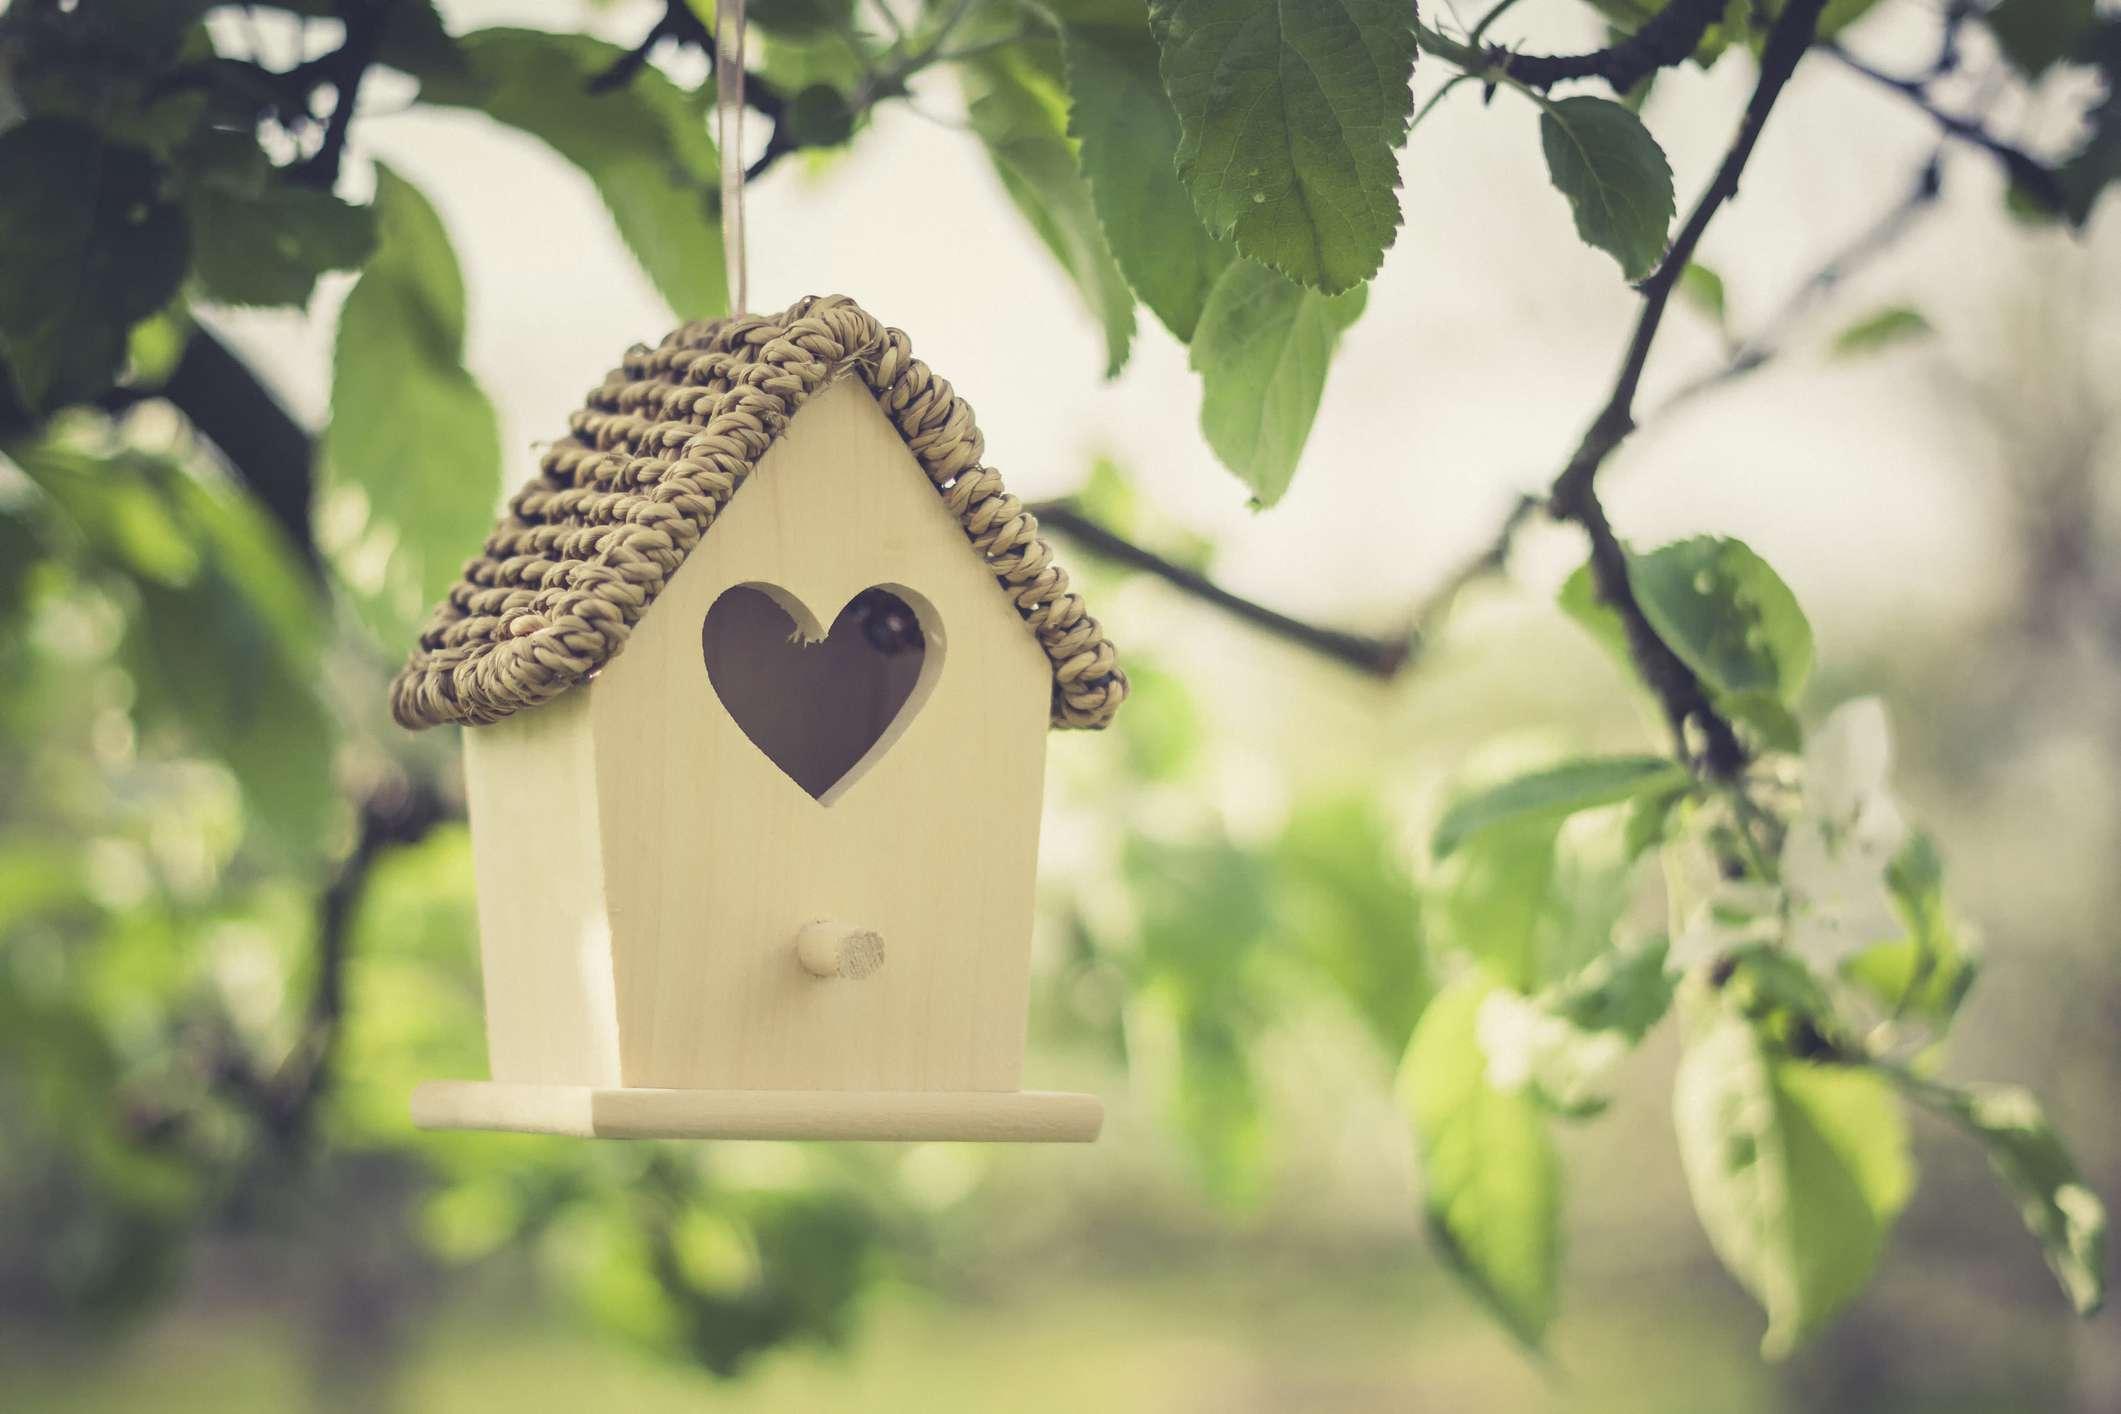 Birdhouse hangs from apple tree